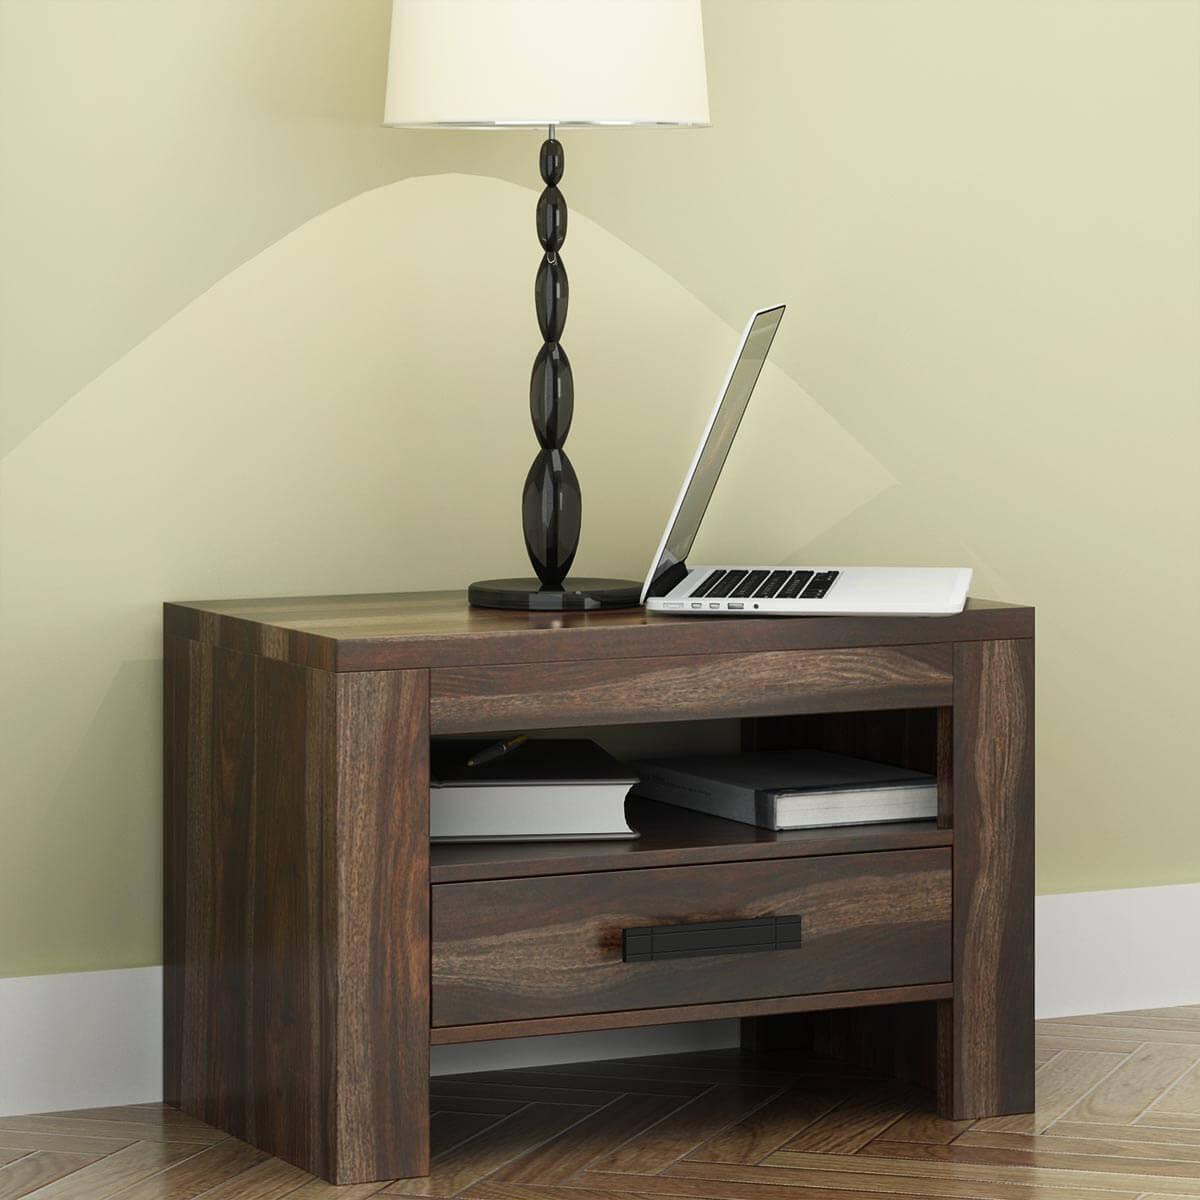 Roanoke Rustic Solid Wood One Drawer Nightstand